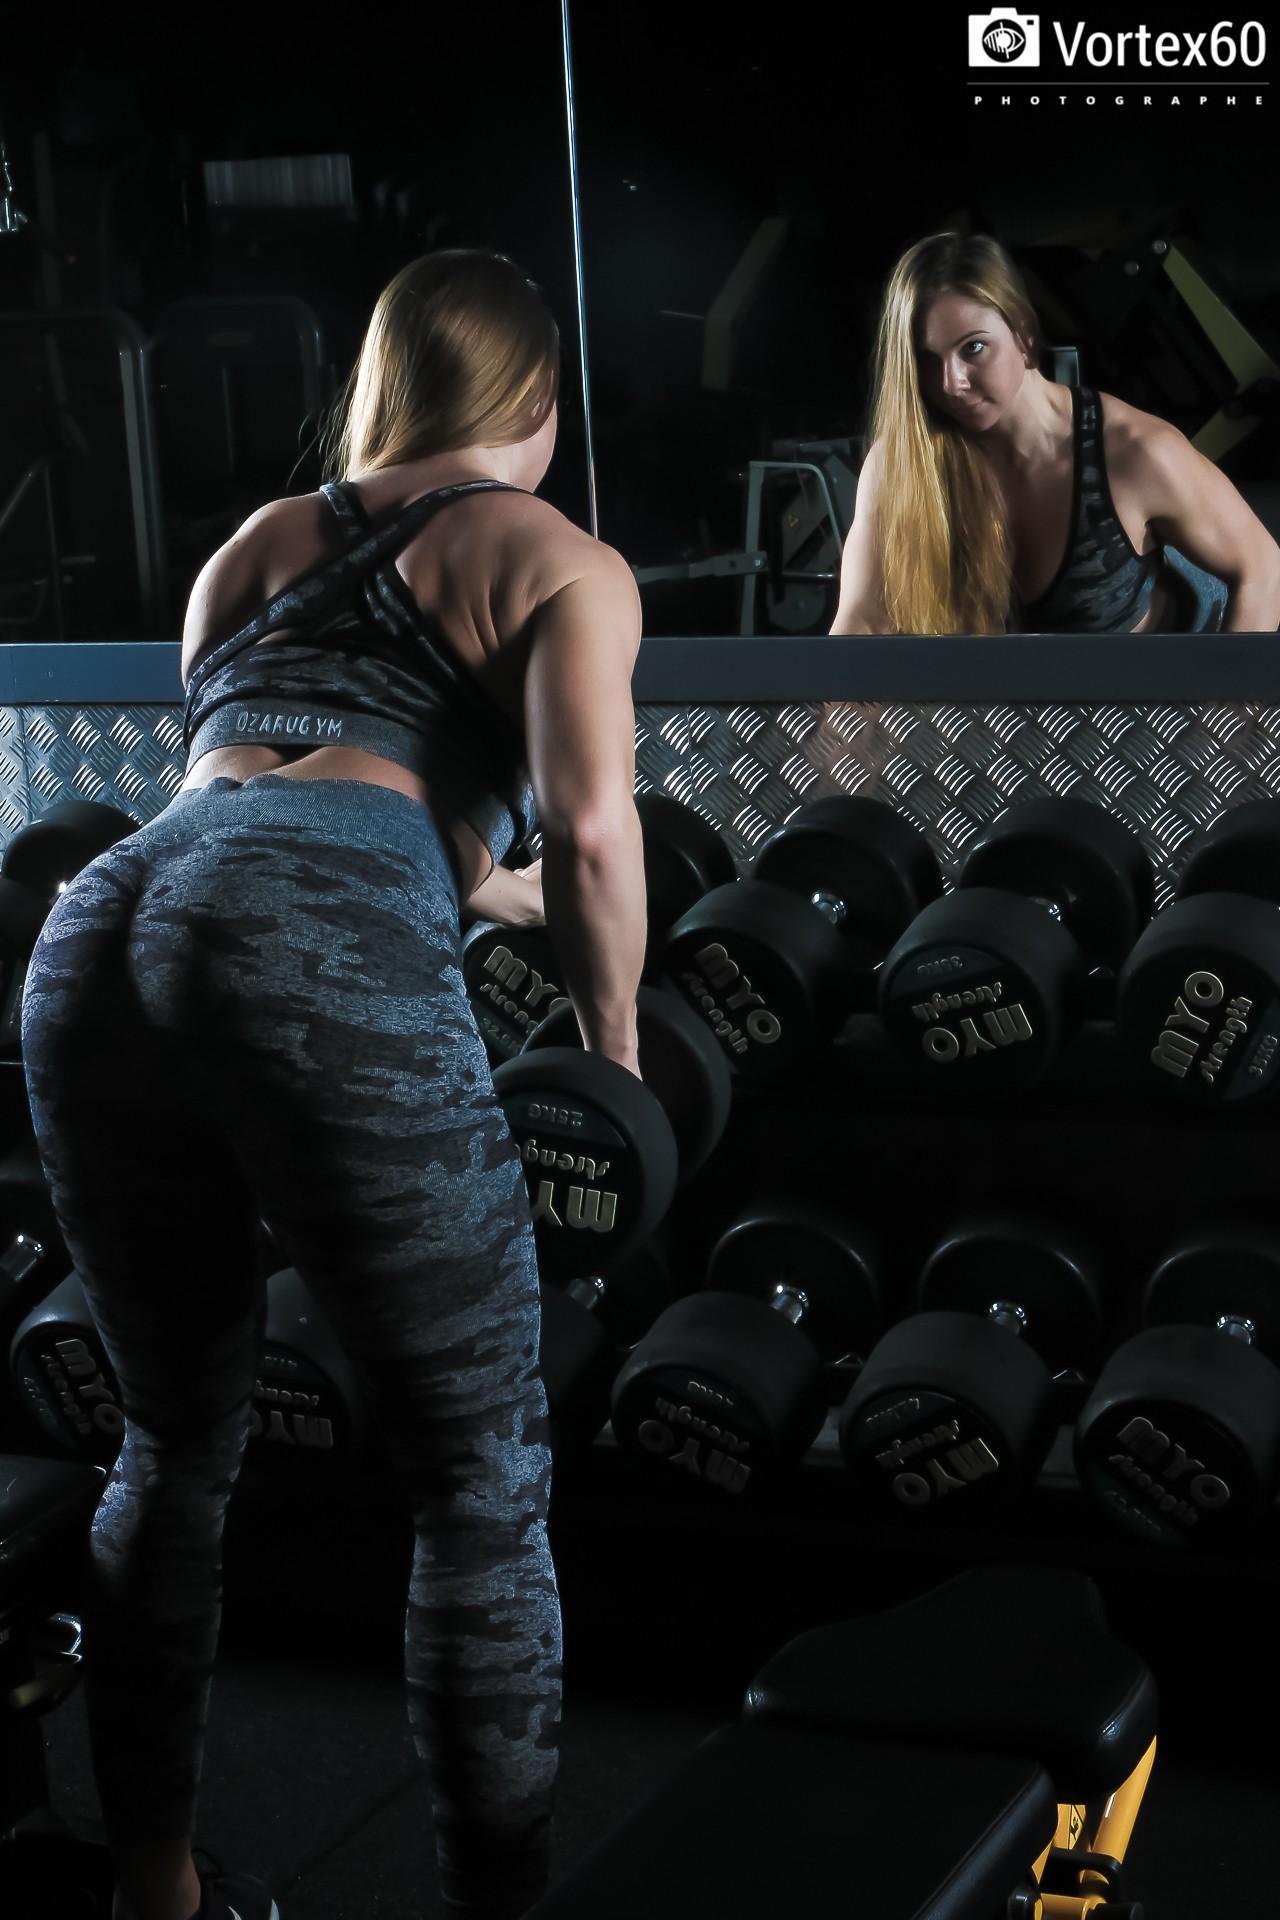 girls and Sport - Angeline by Vortex60 Photographe